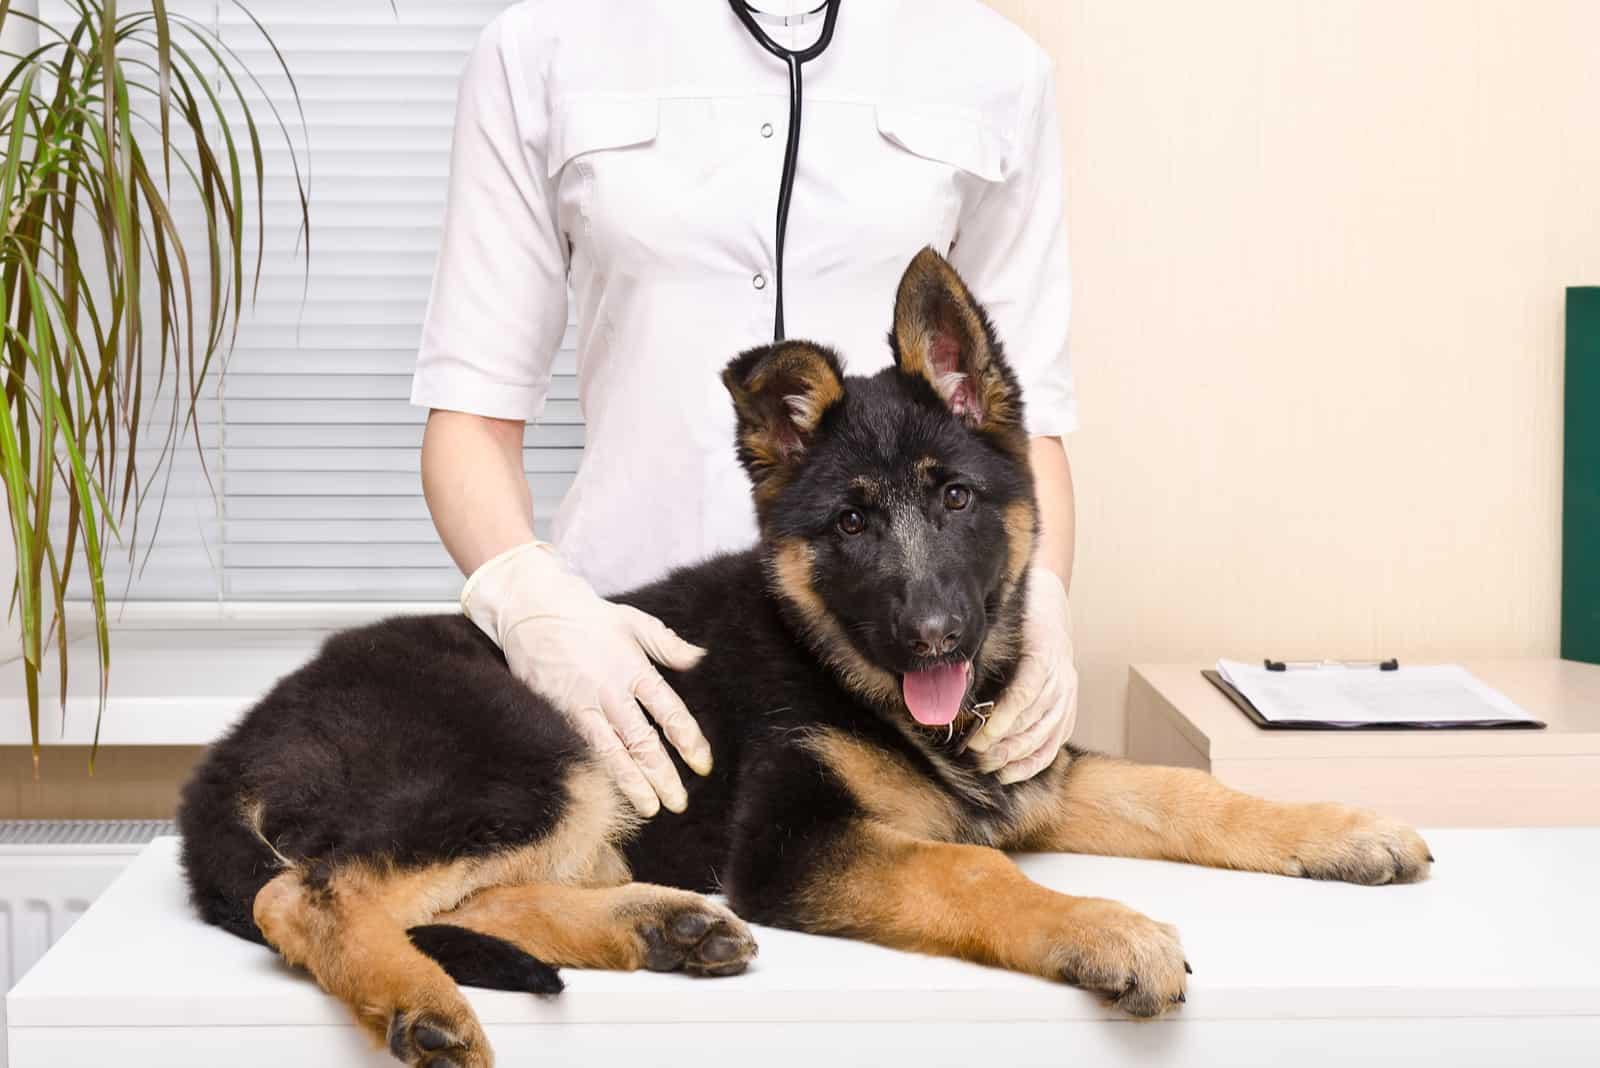 German shepherd puppy at the vet